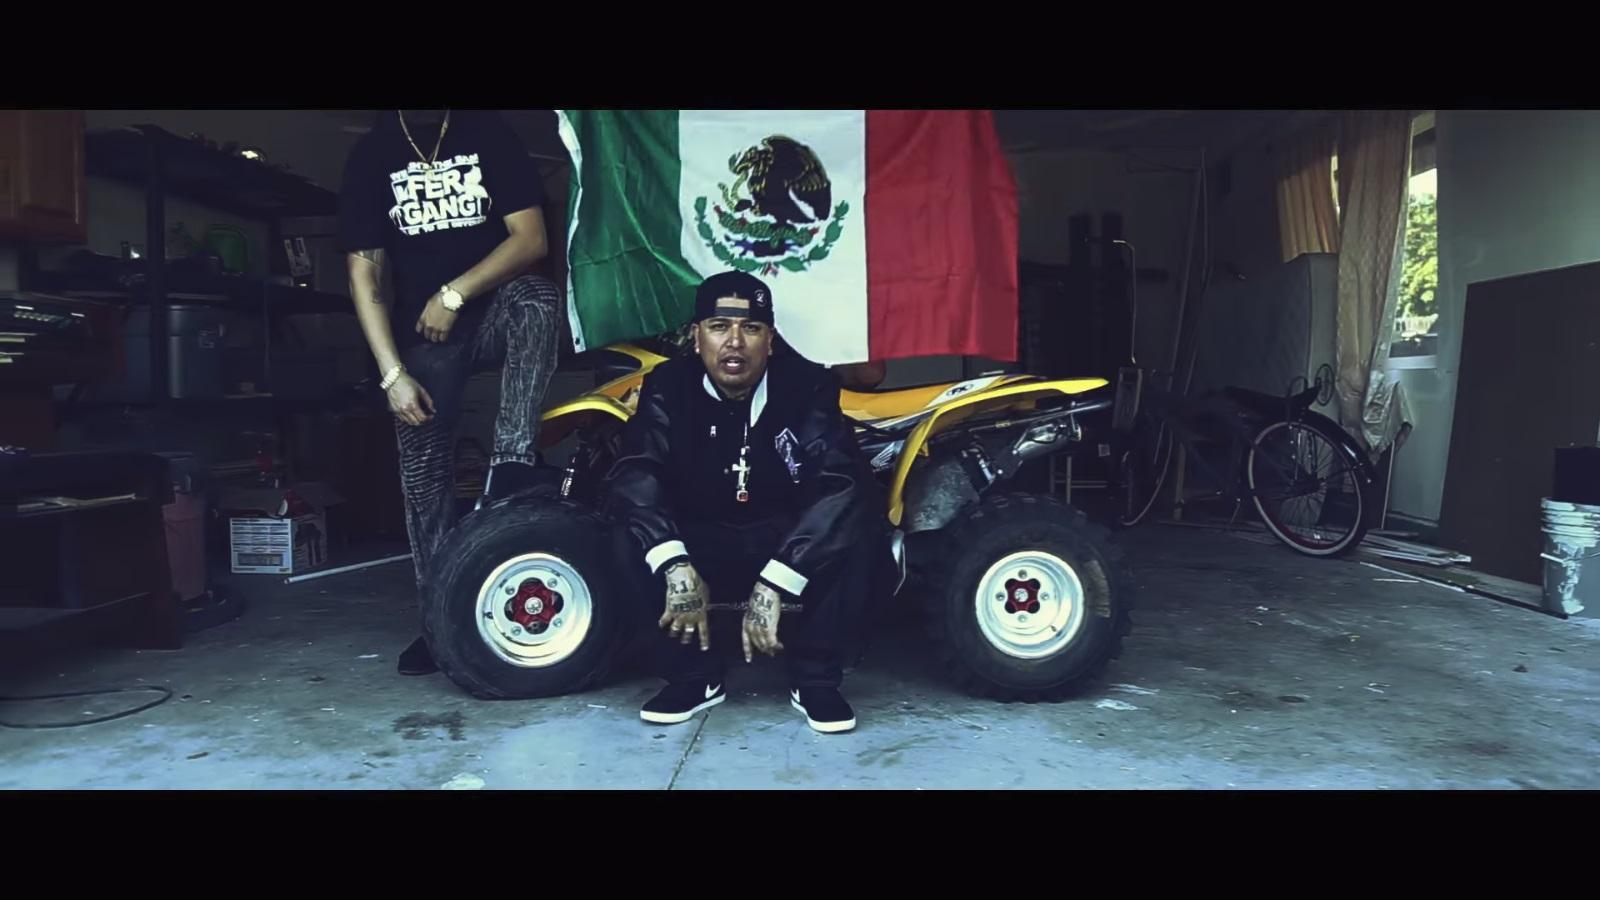 opina goddam, hiphop muindo, latin hiphop, latino rap, latino hiphop